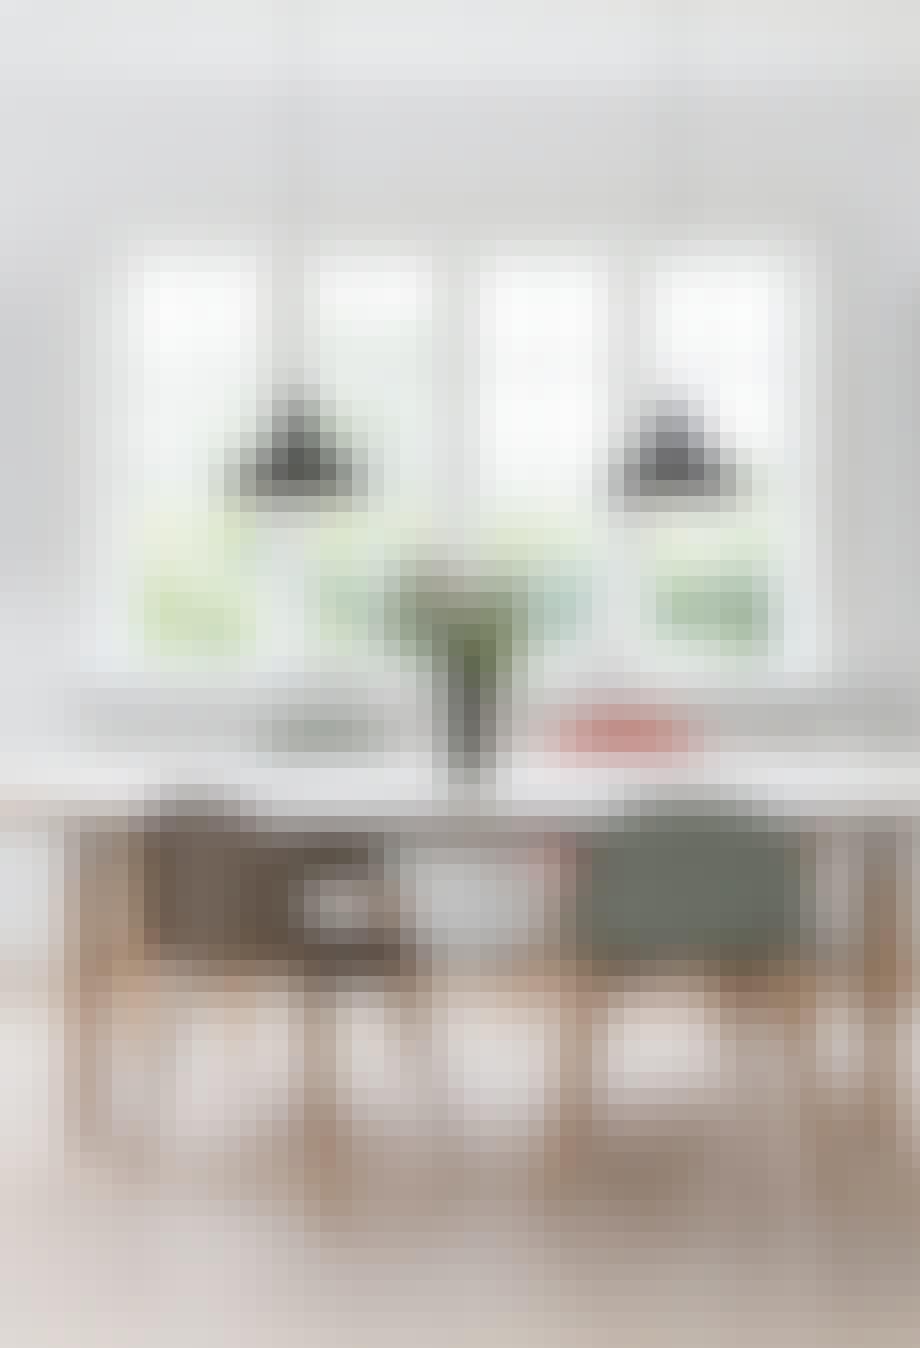 spisestue med spisebord og stole og stort vindue